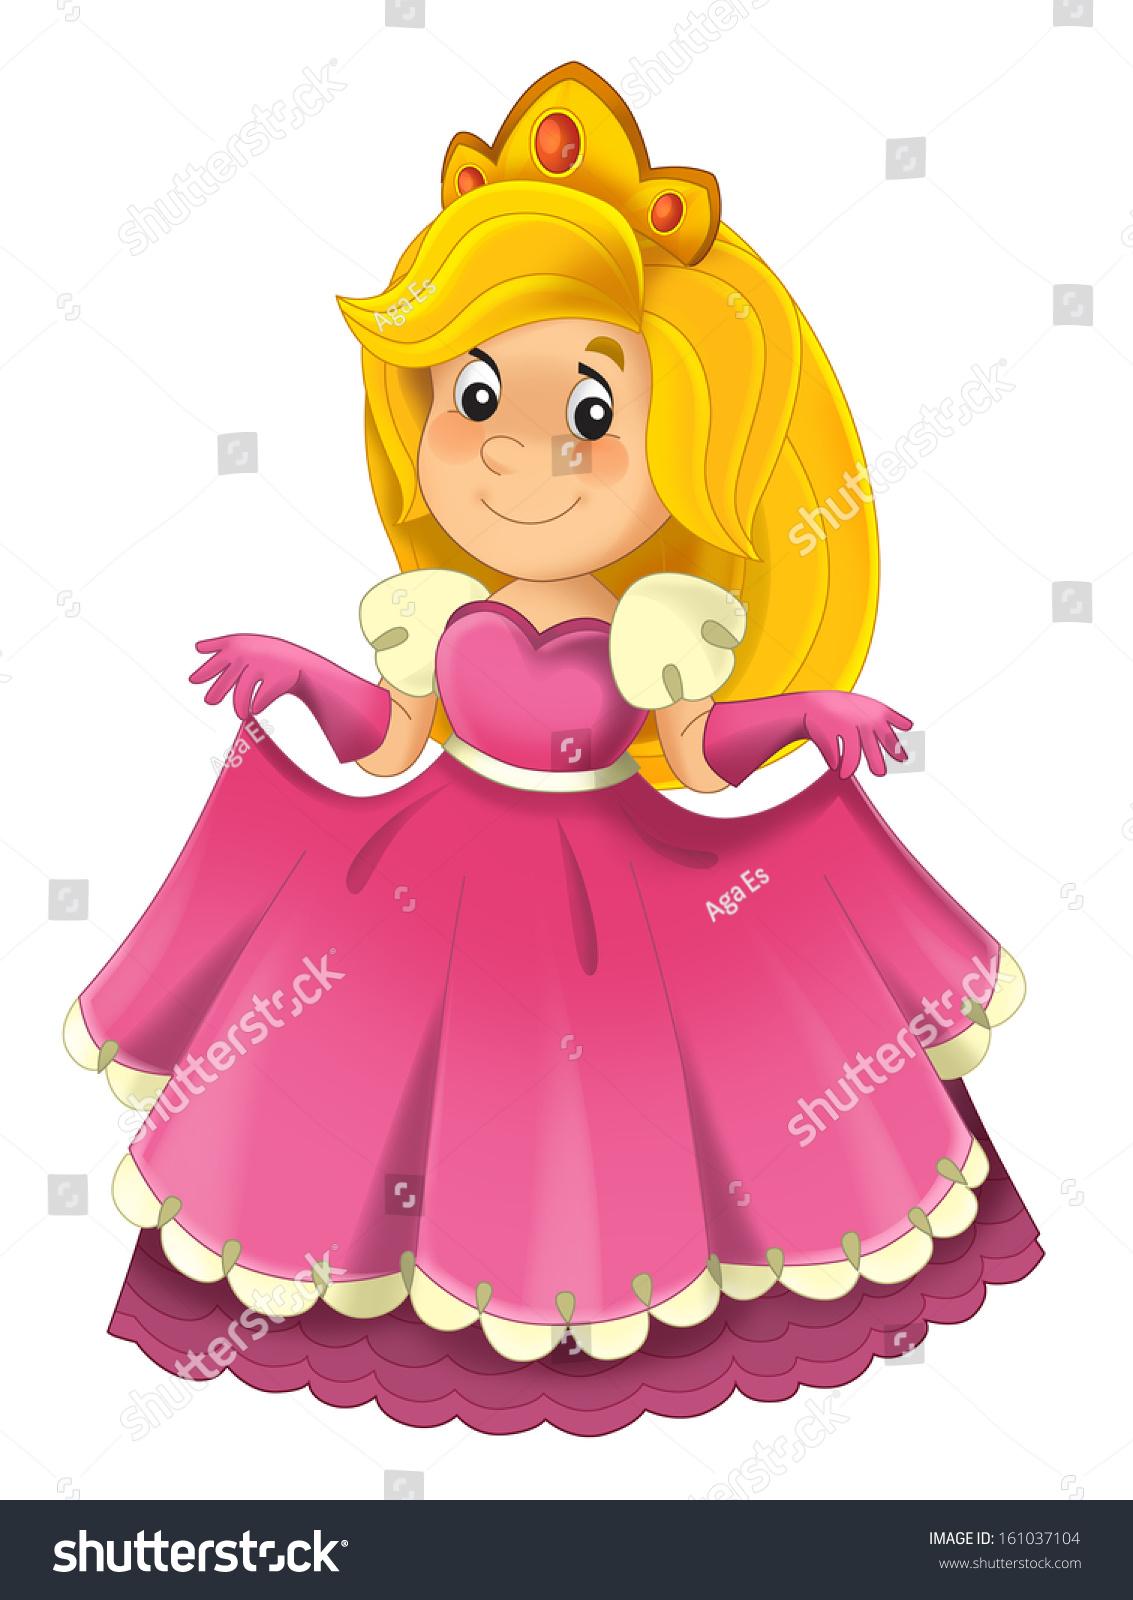 Cartoon princess illustration children stock illustration - Images princesse ...